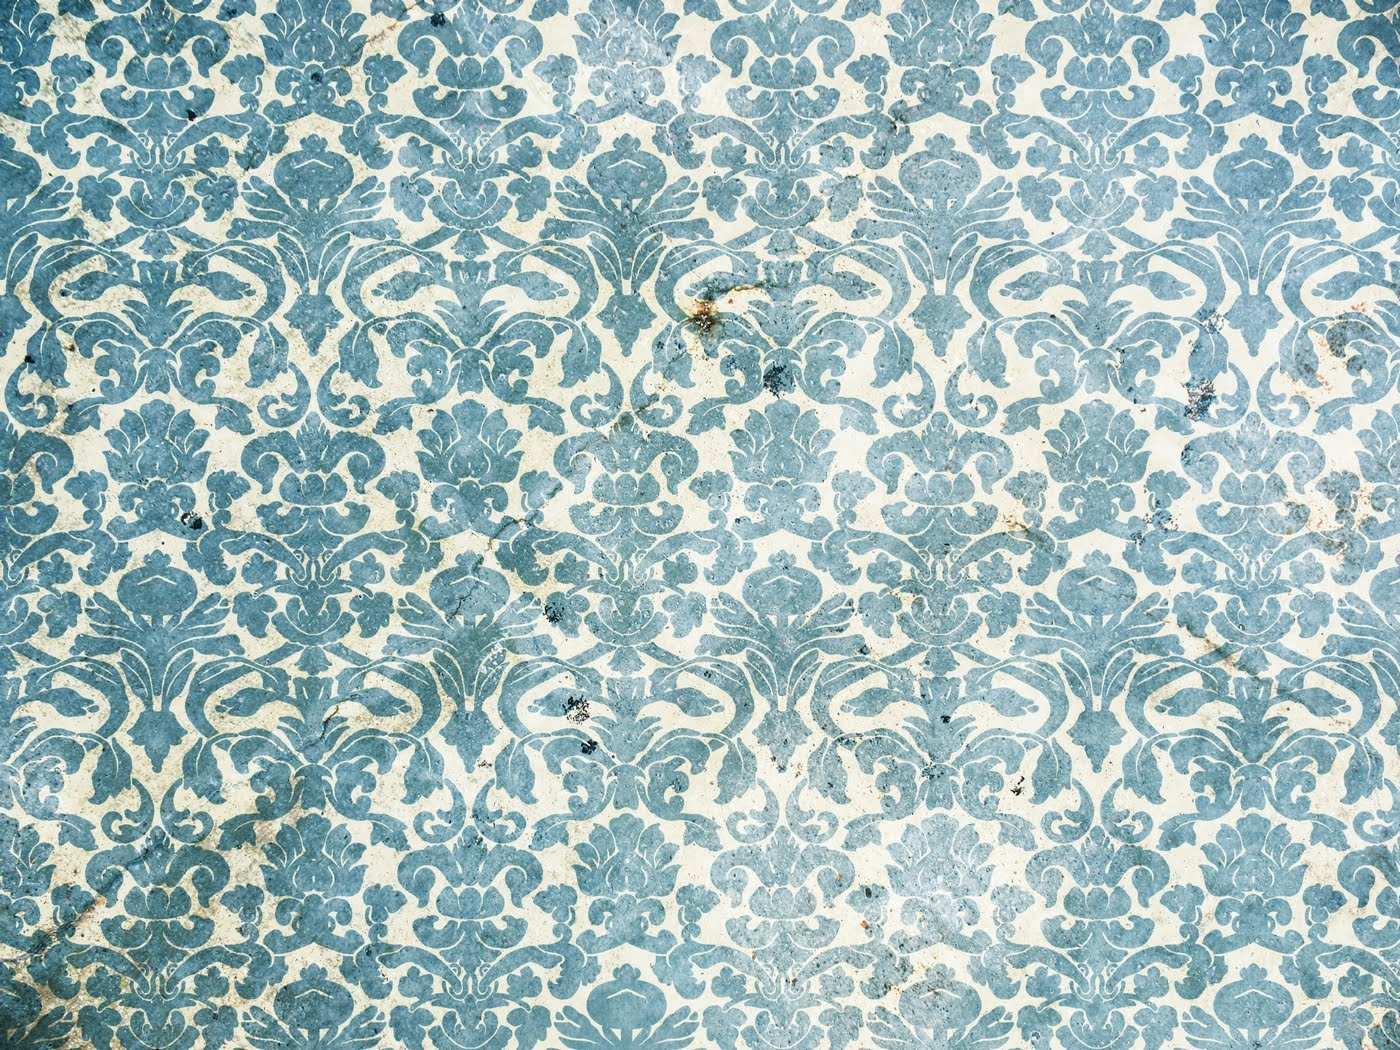 vintage wallpaper designs 2017 - Grasscloth Wallpaper